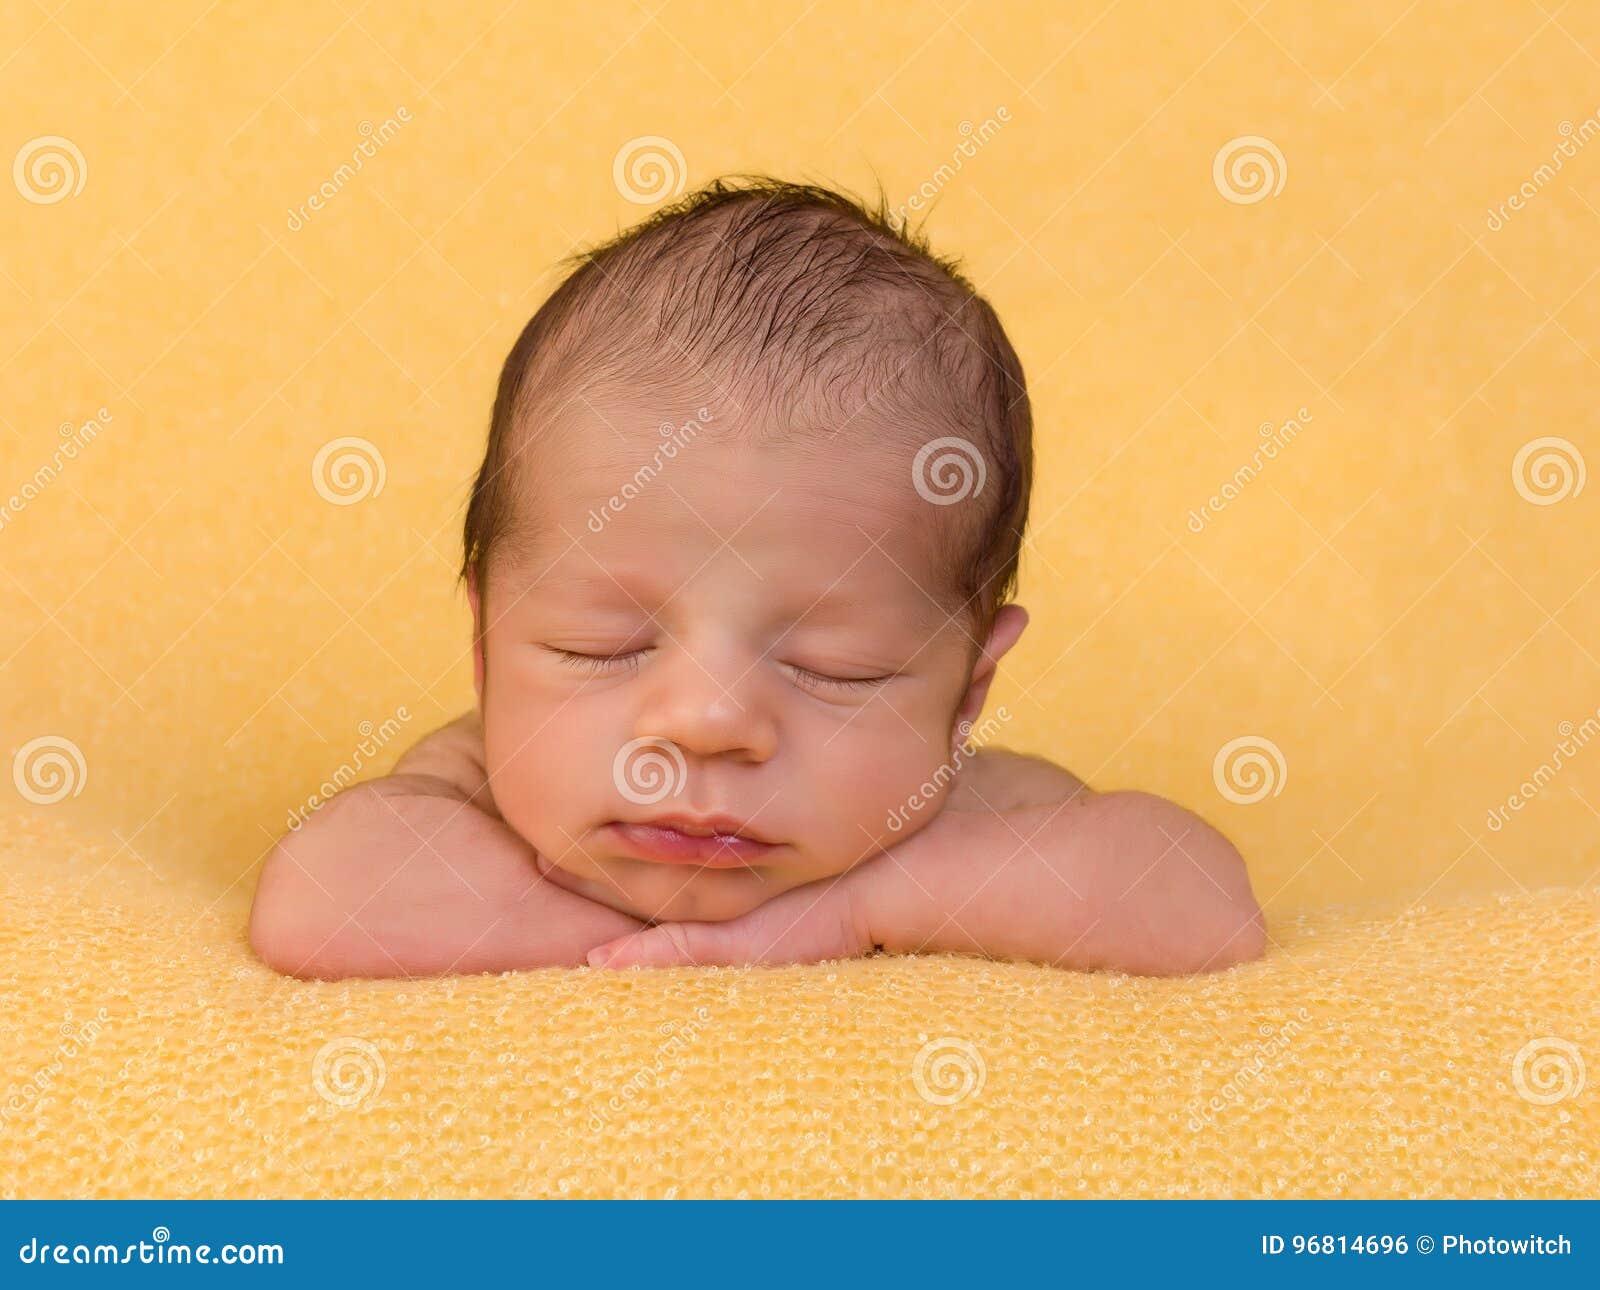 One week old baby boy